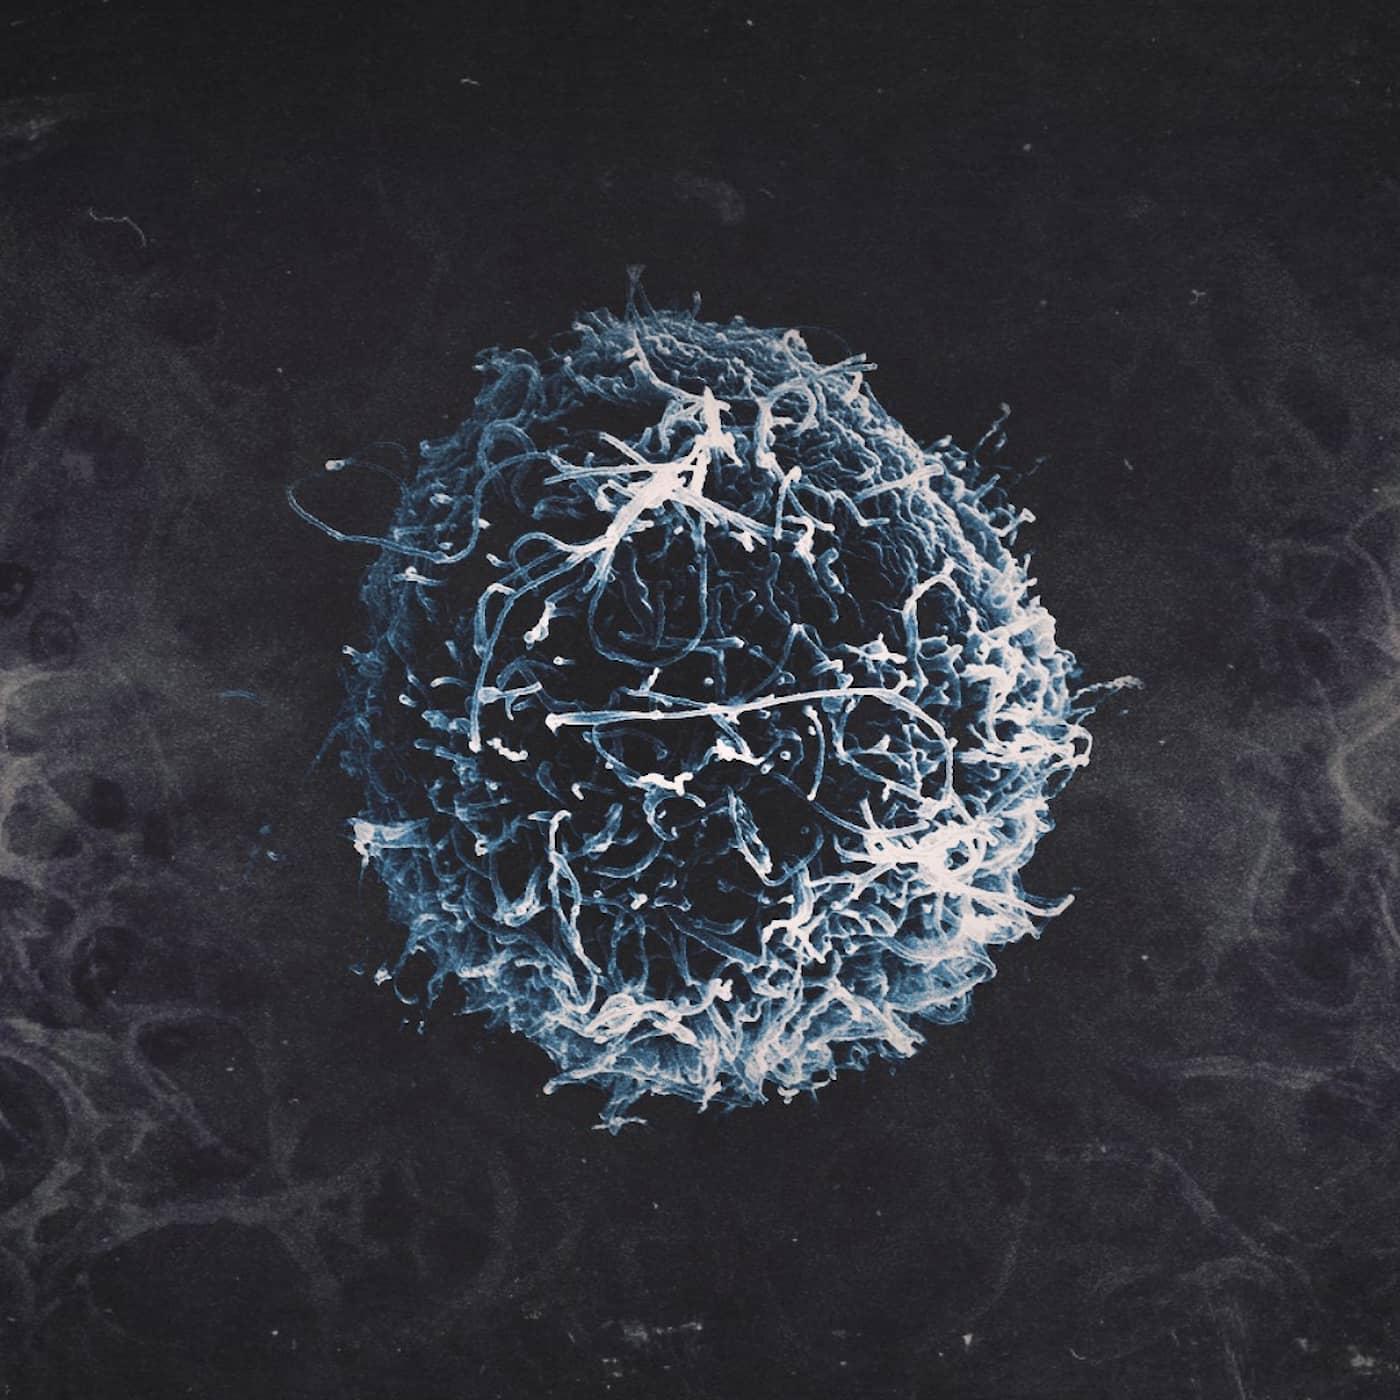 BONUSAVSNITT: Coronavirus 2019-nCoV